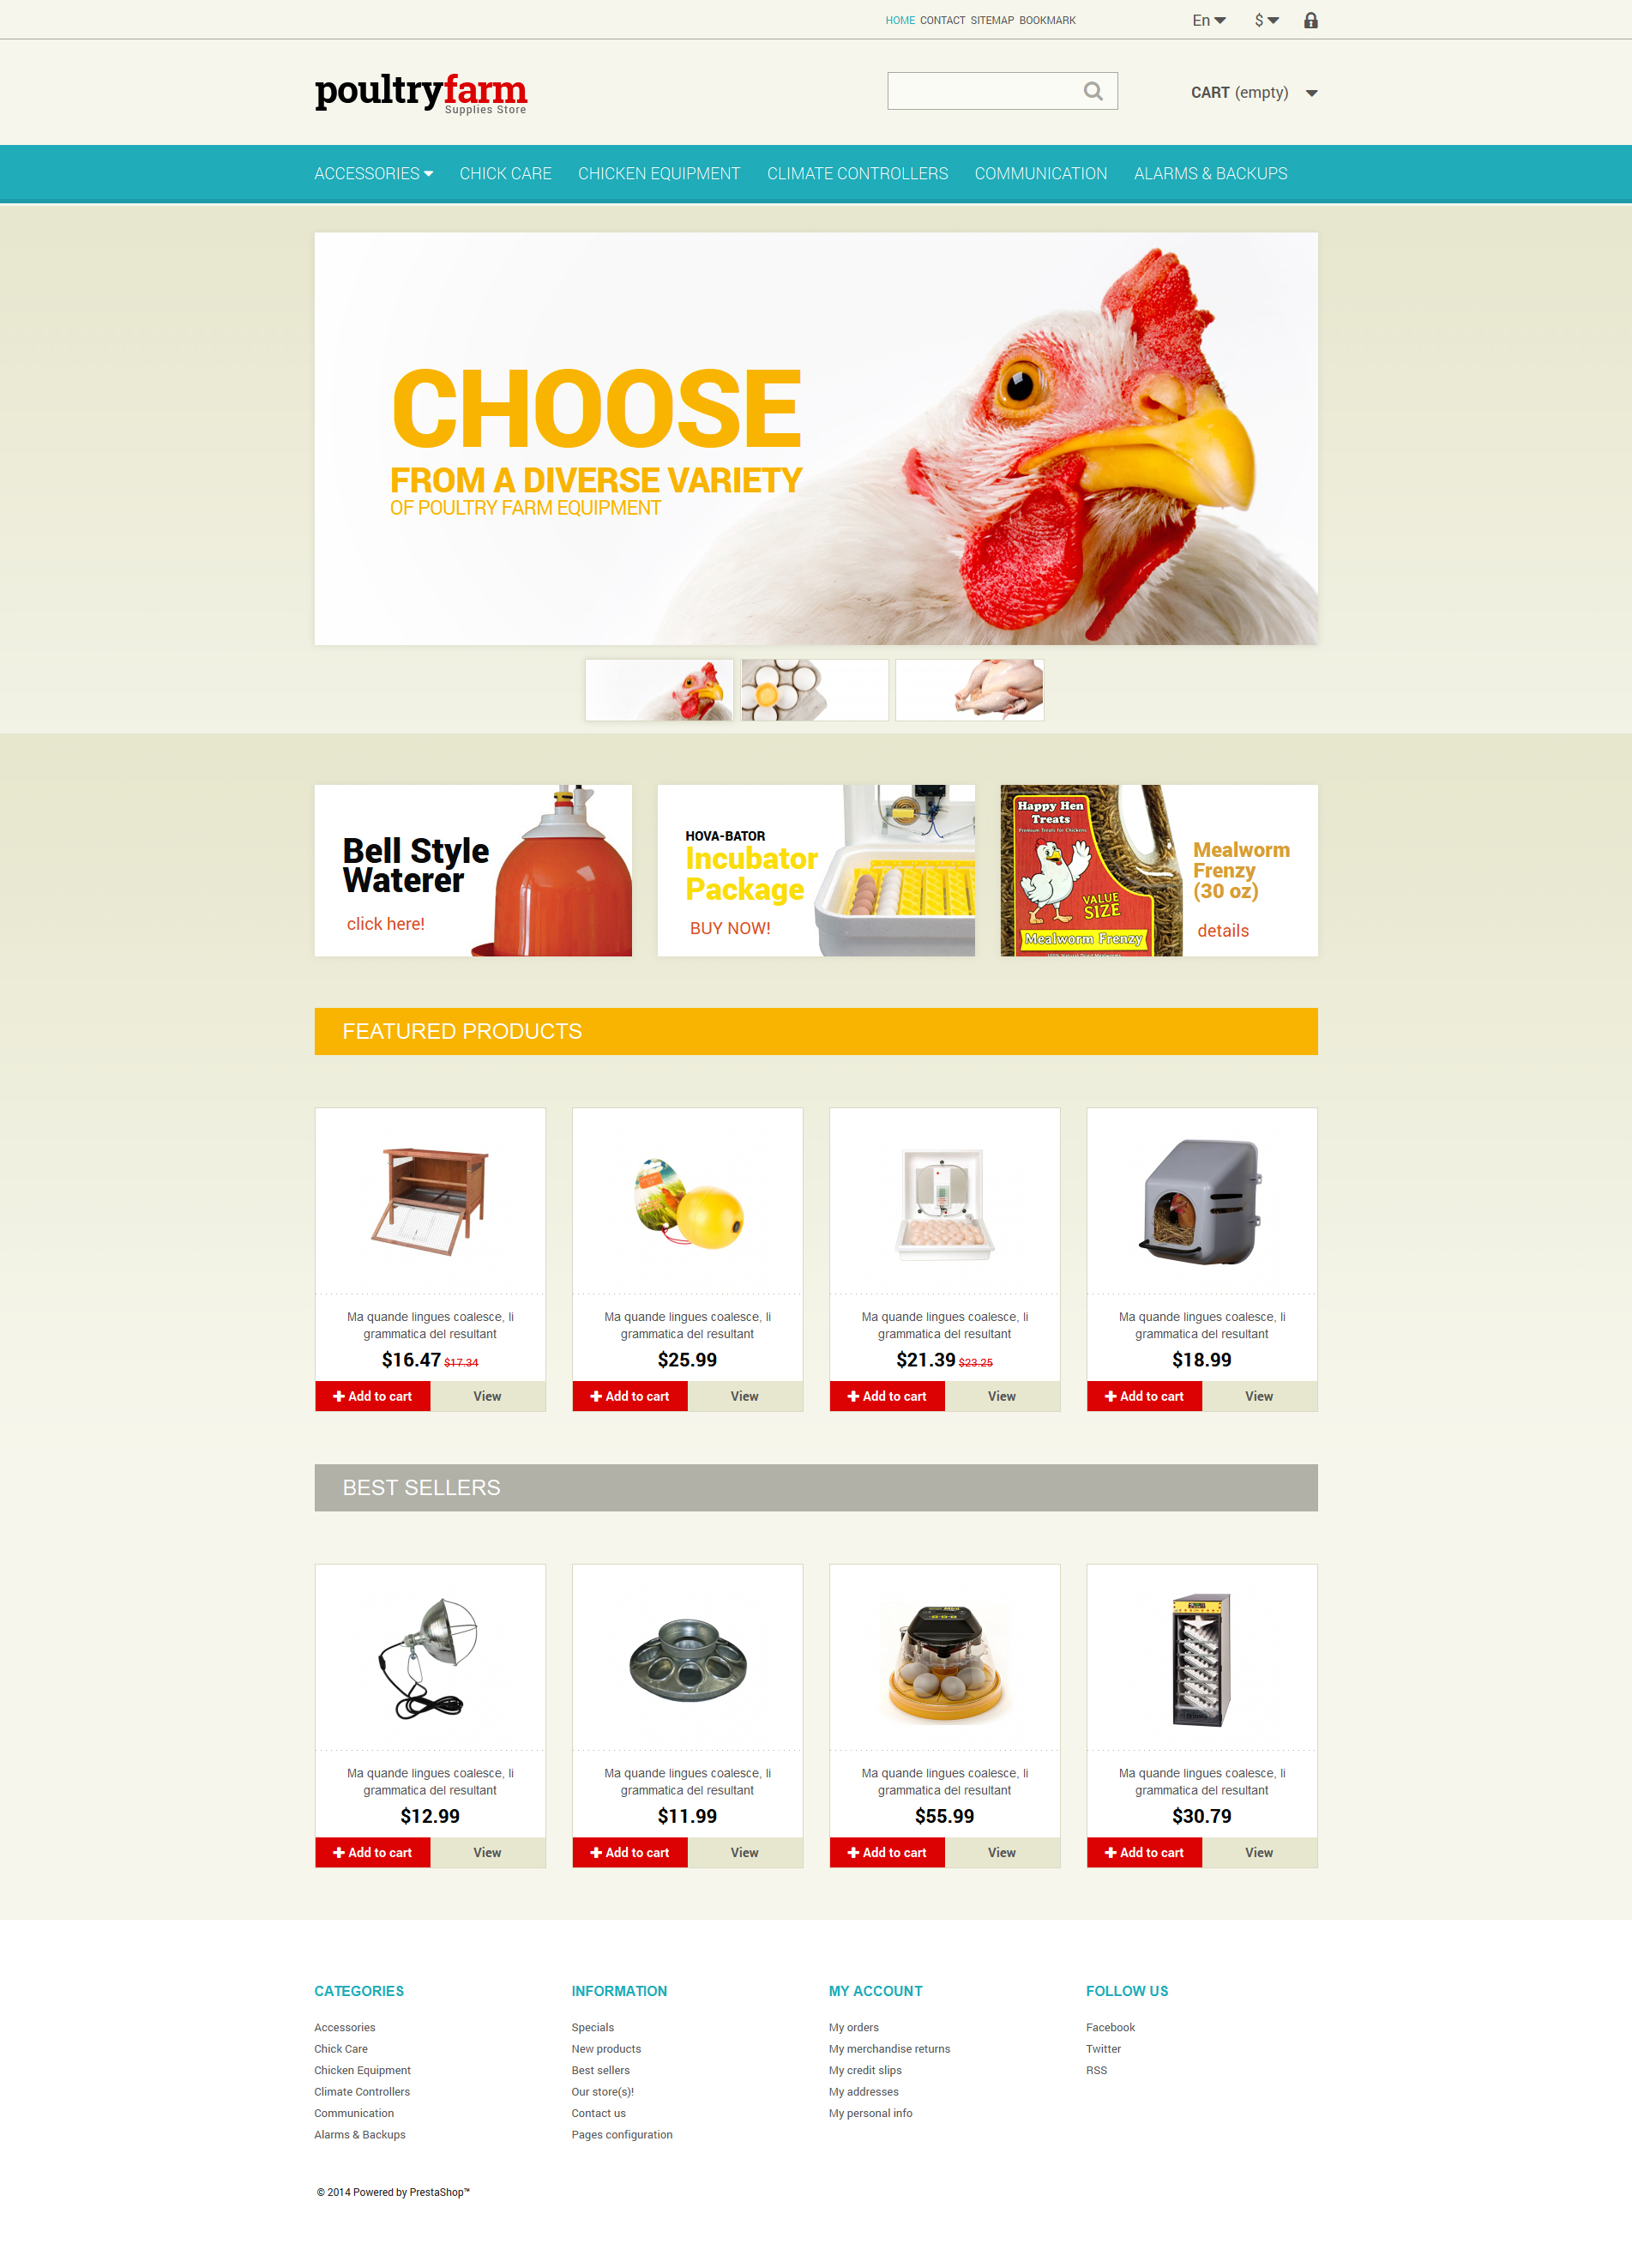 Poultry farm website template #25106.